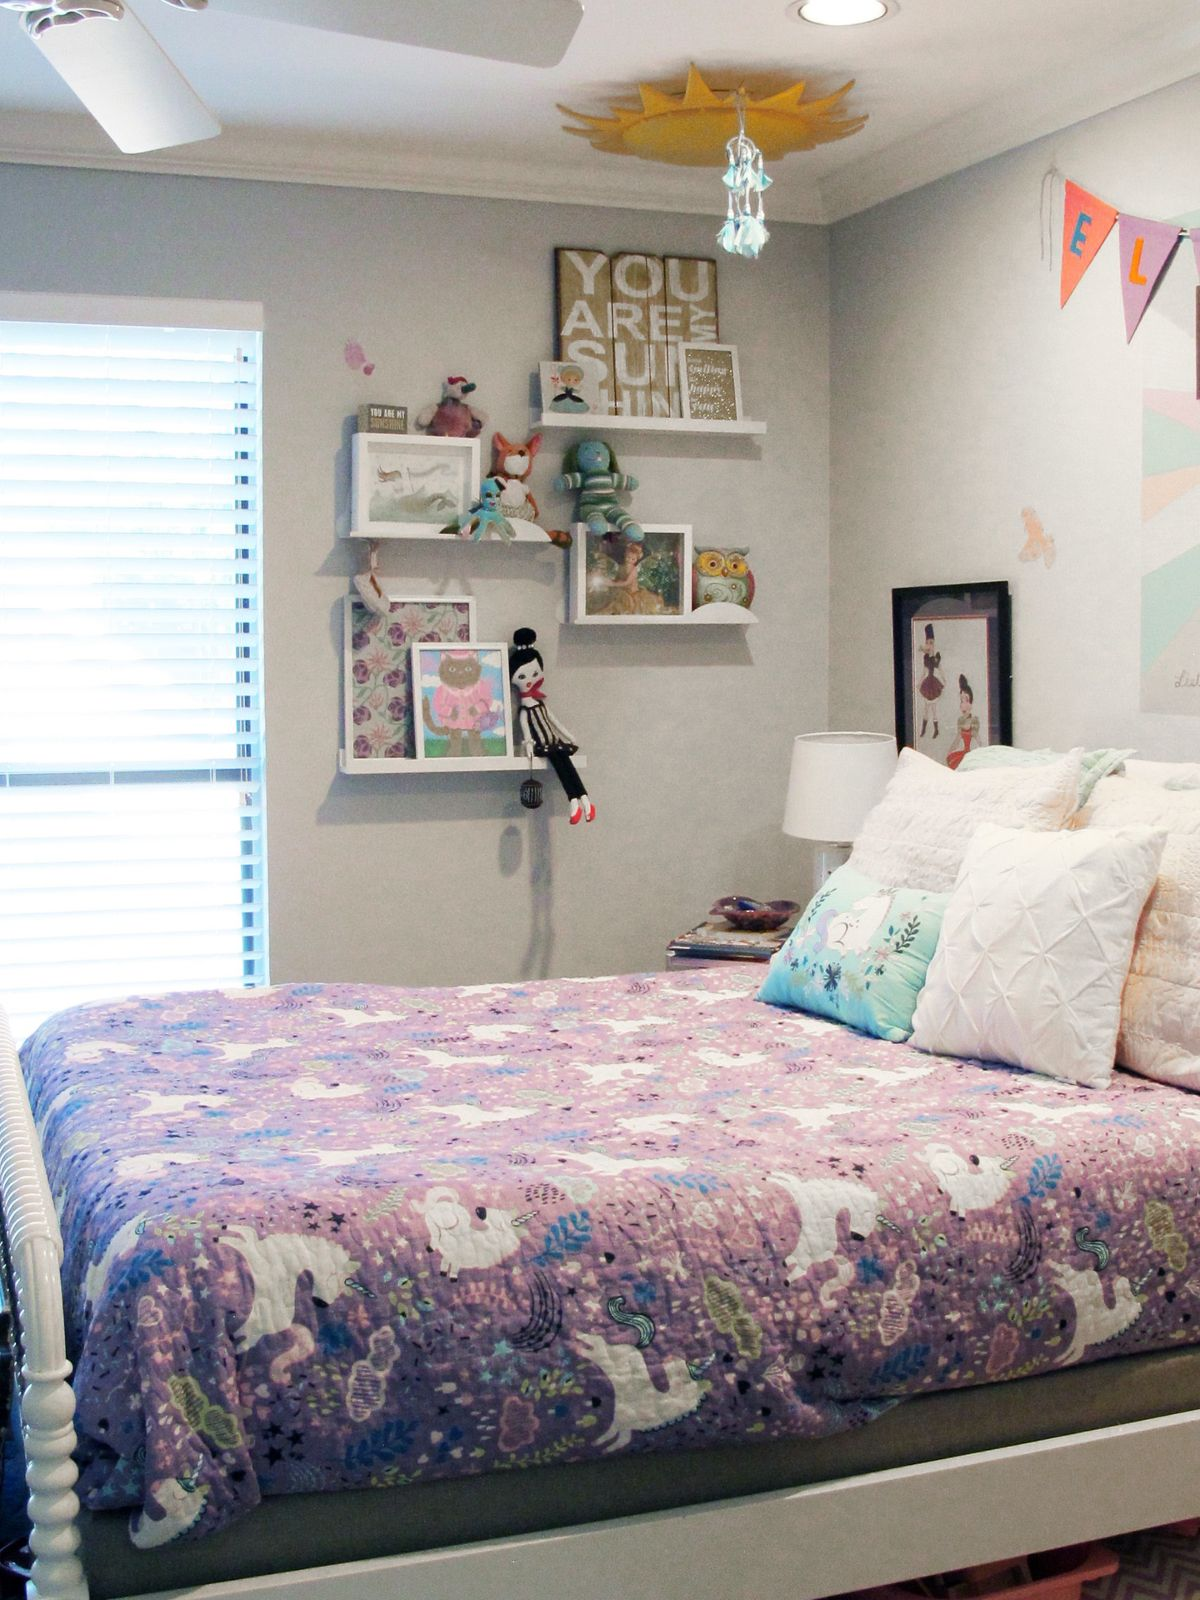 Kirkpatrick Contemporary Home Photo Video Shoot Location Dallas 23.jpg